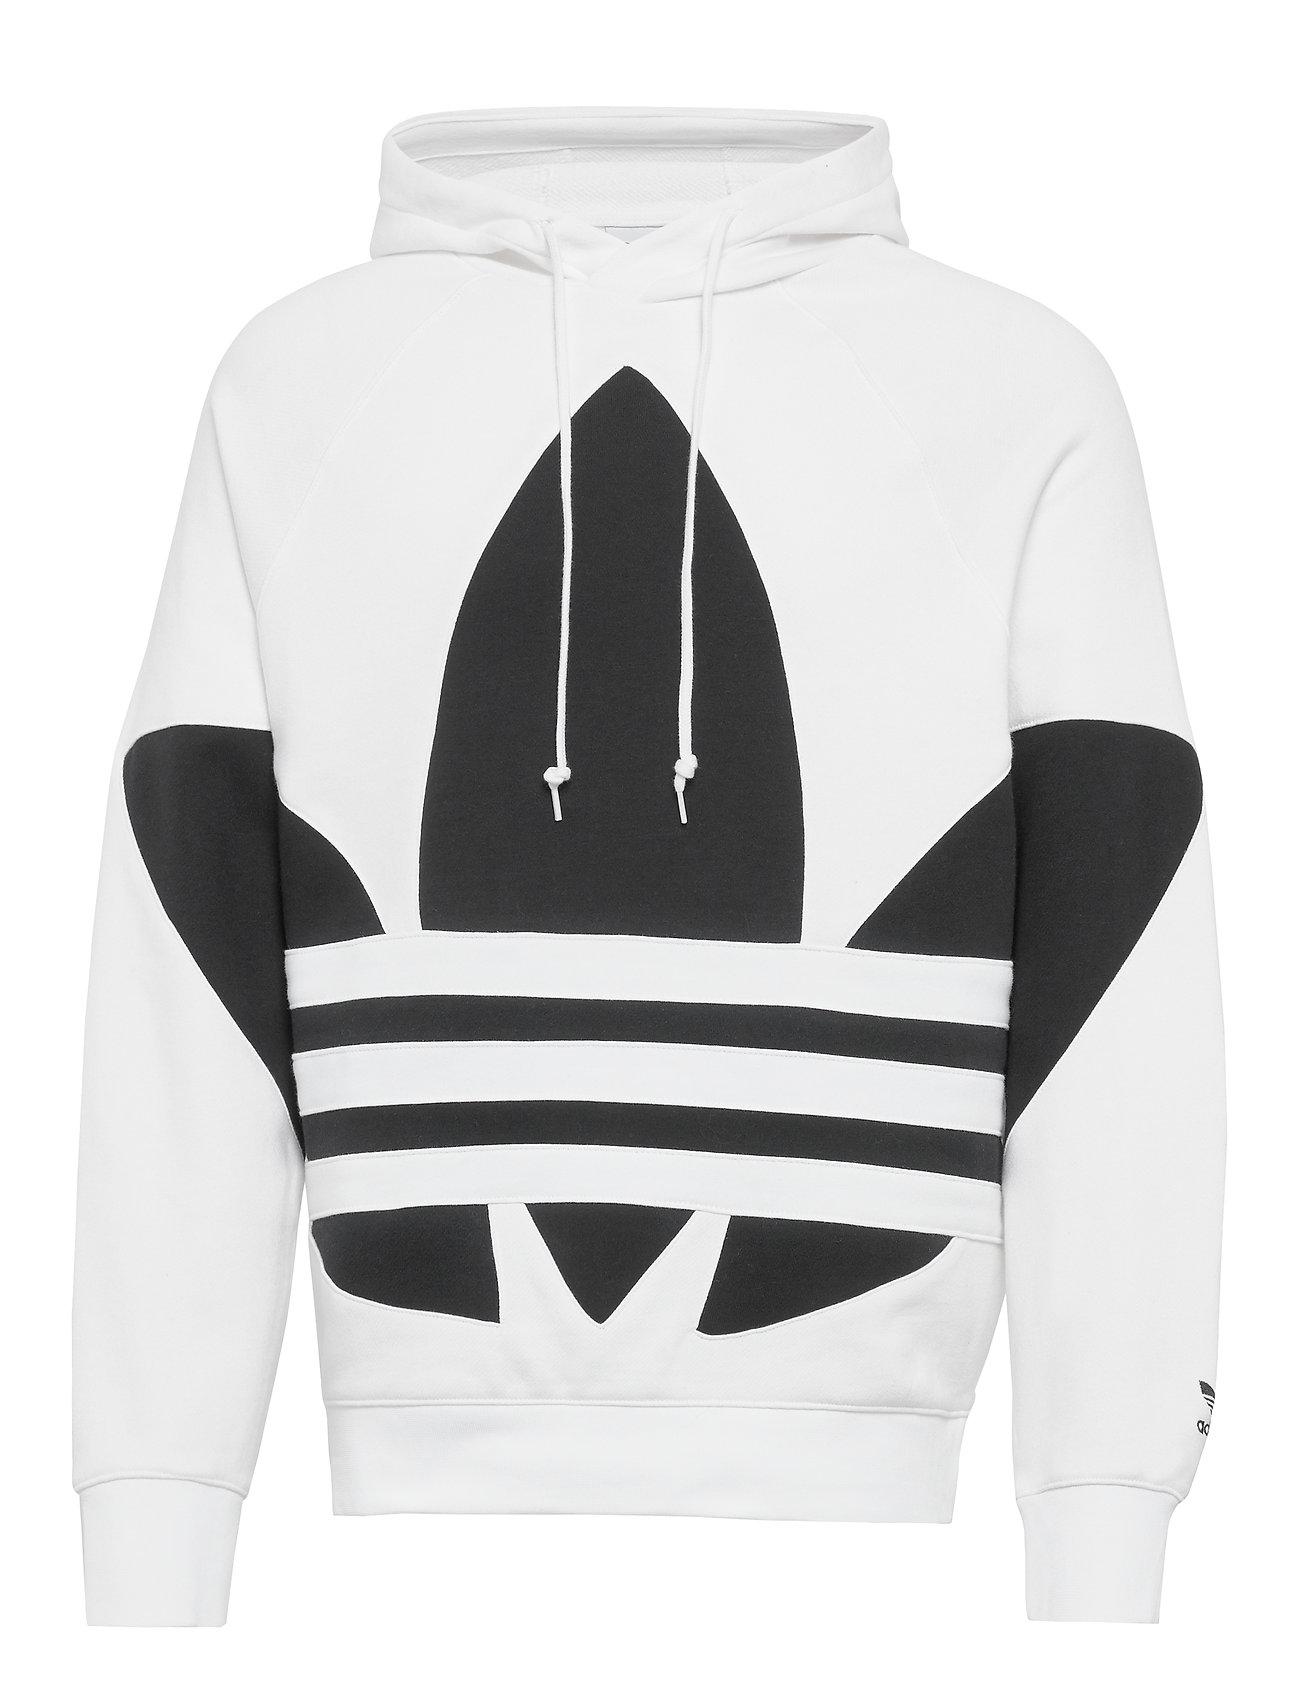 adidas Originals BG TREFOIL HOOD - WHITE